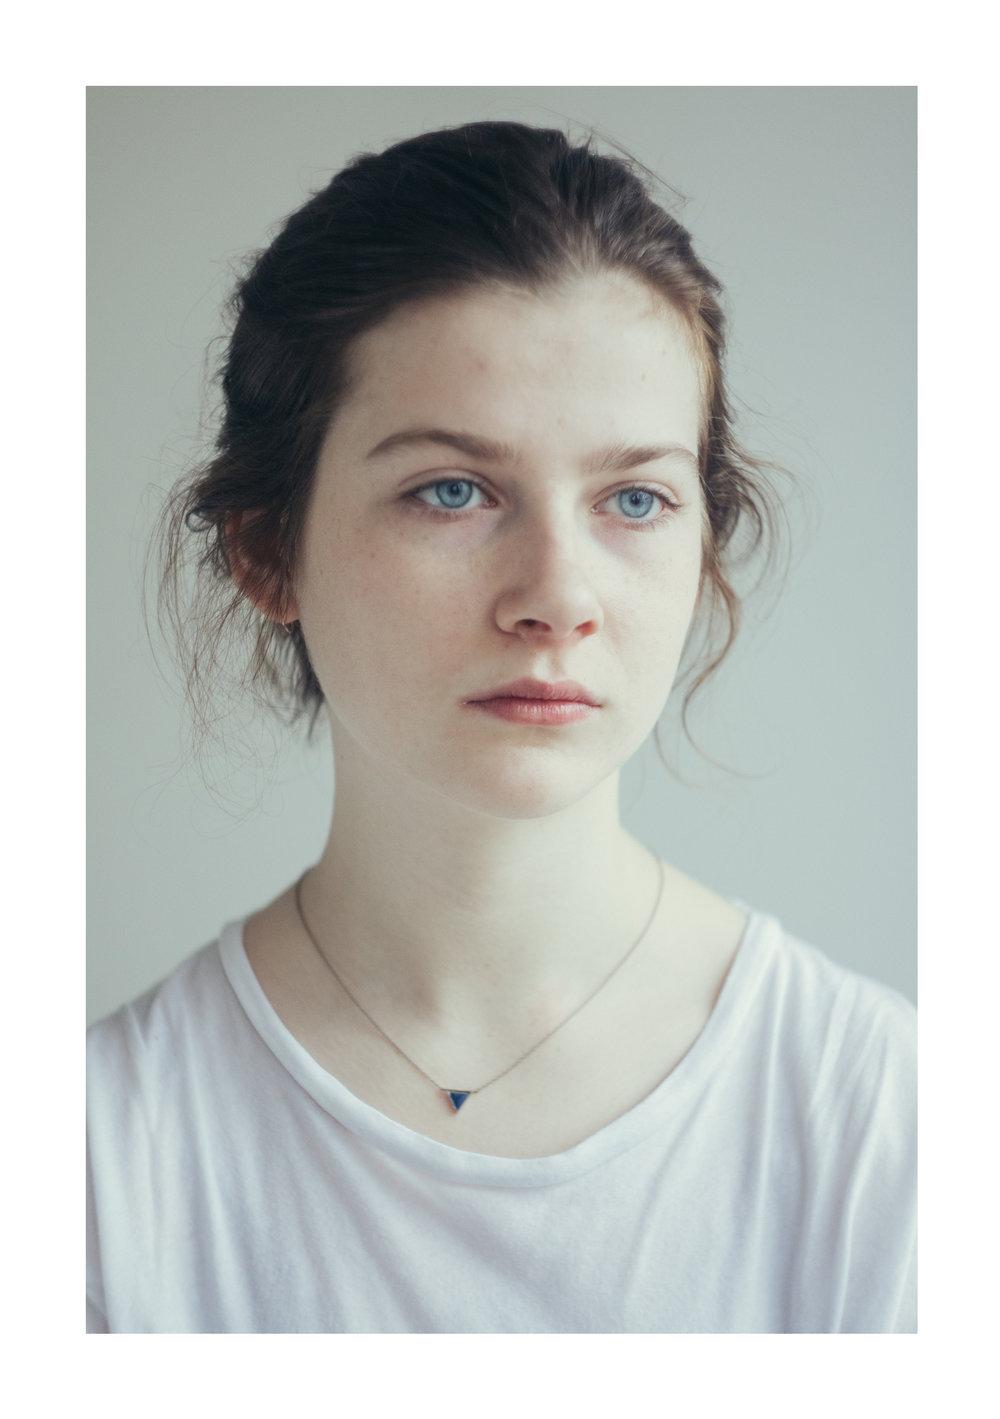 Portraits Porfolio - Unai Mateo.jpg